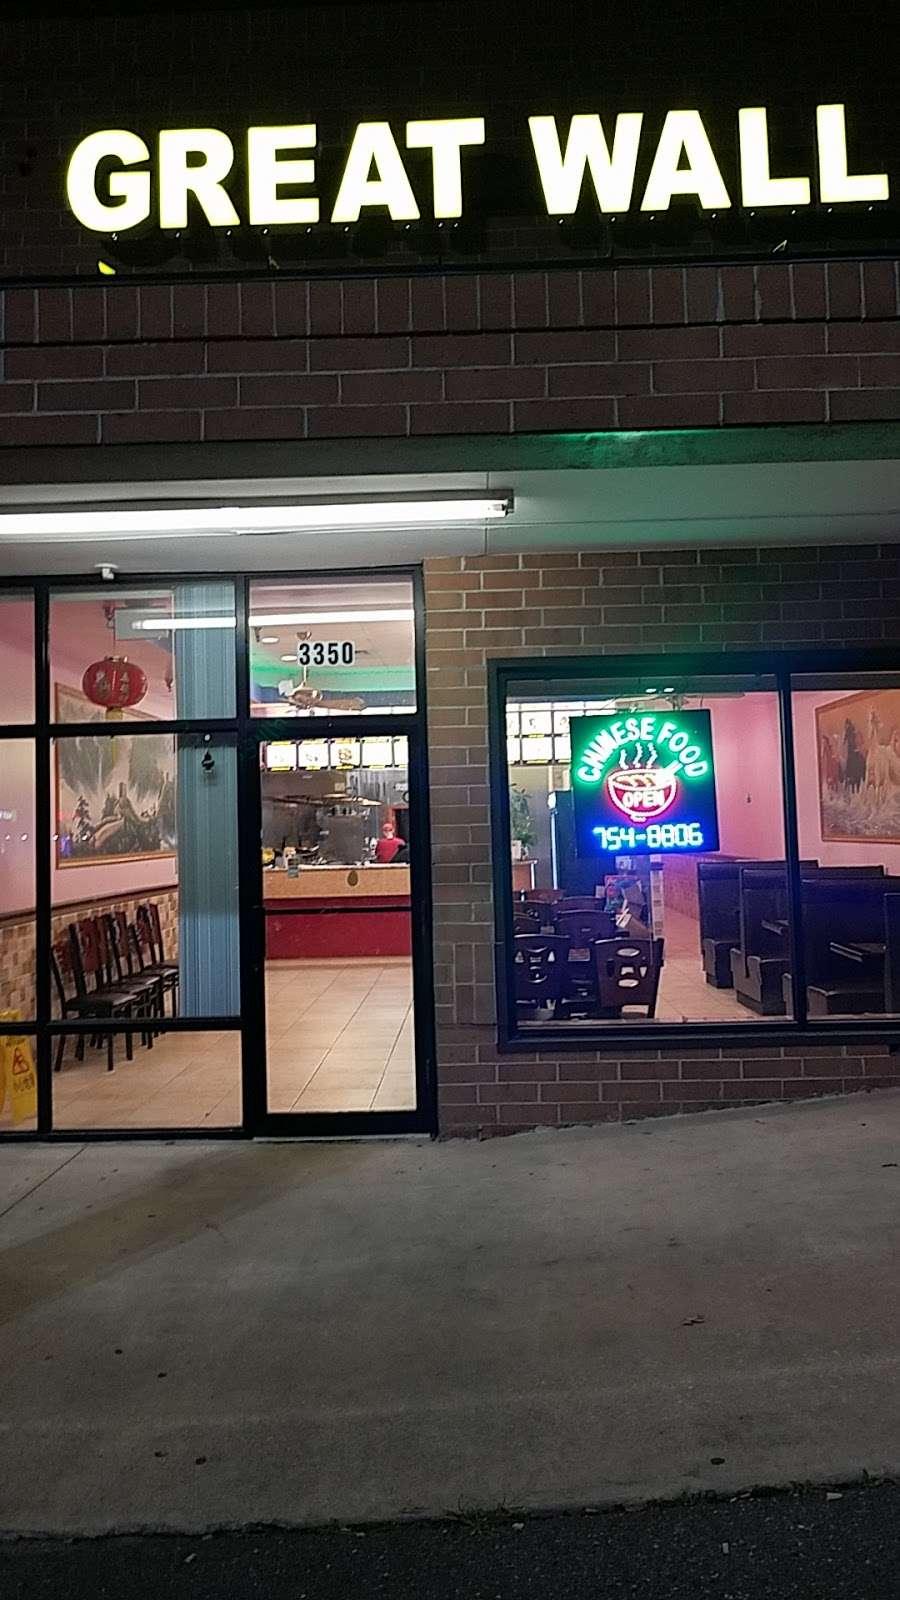 Great Wall Restaurant - restaurant  | Photo 6 of 6 | Address: 3350 Hayman Dr, Federalsburg, MD 21632, USA | Phone: (410) 754-8806